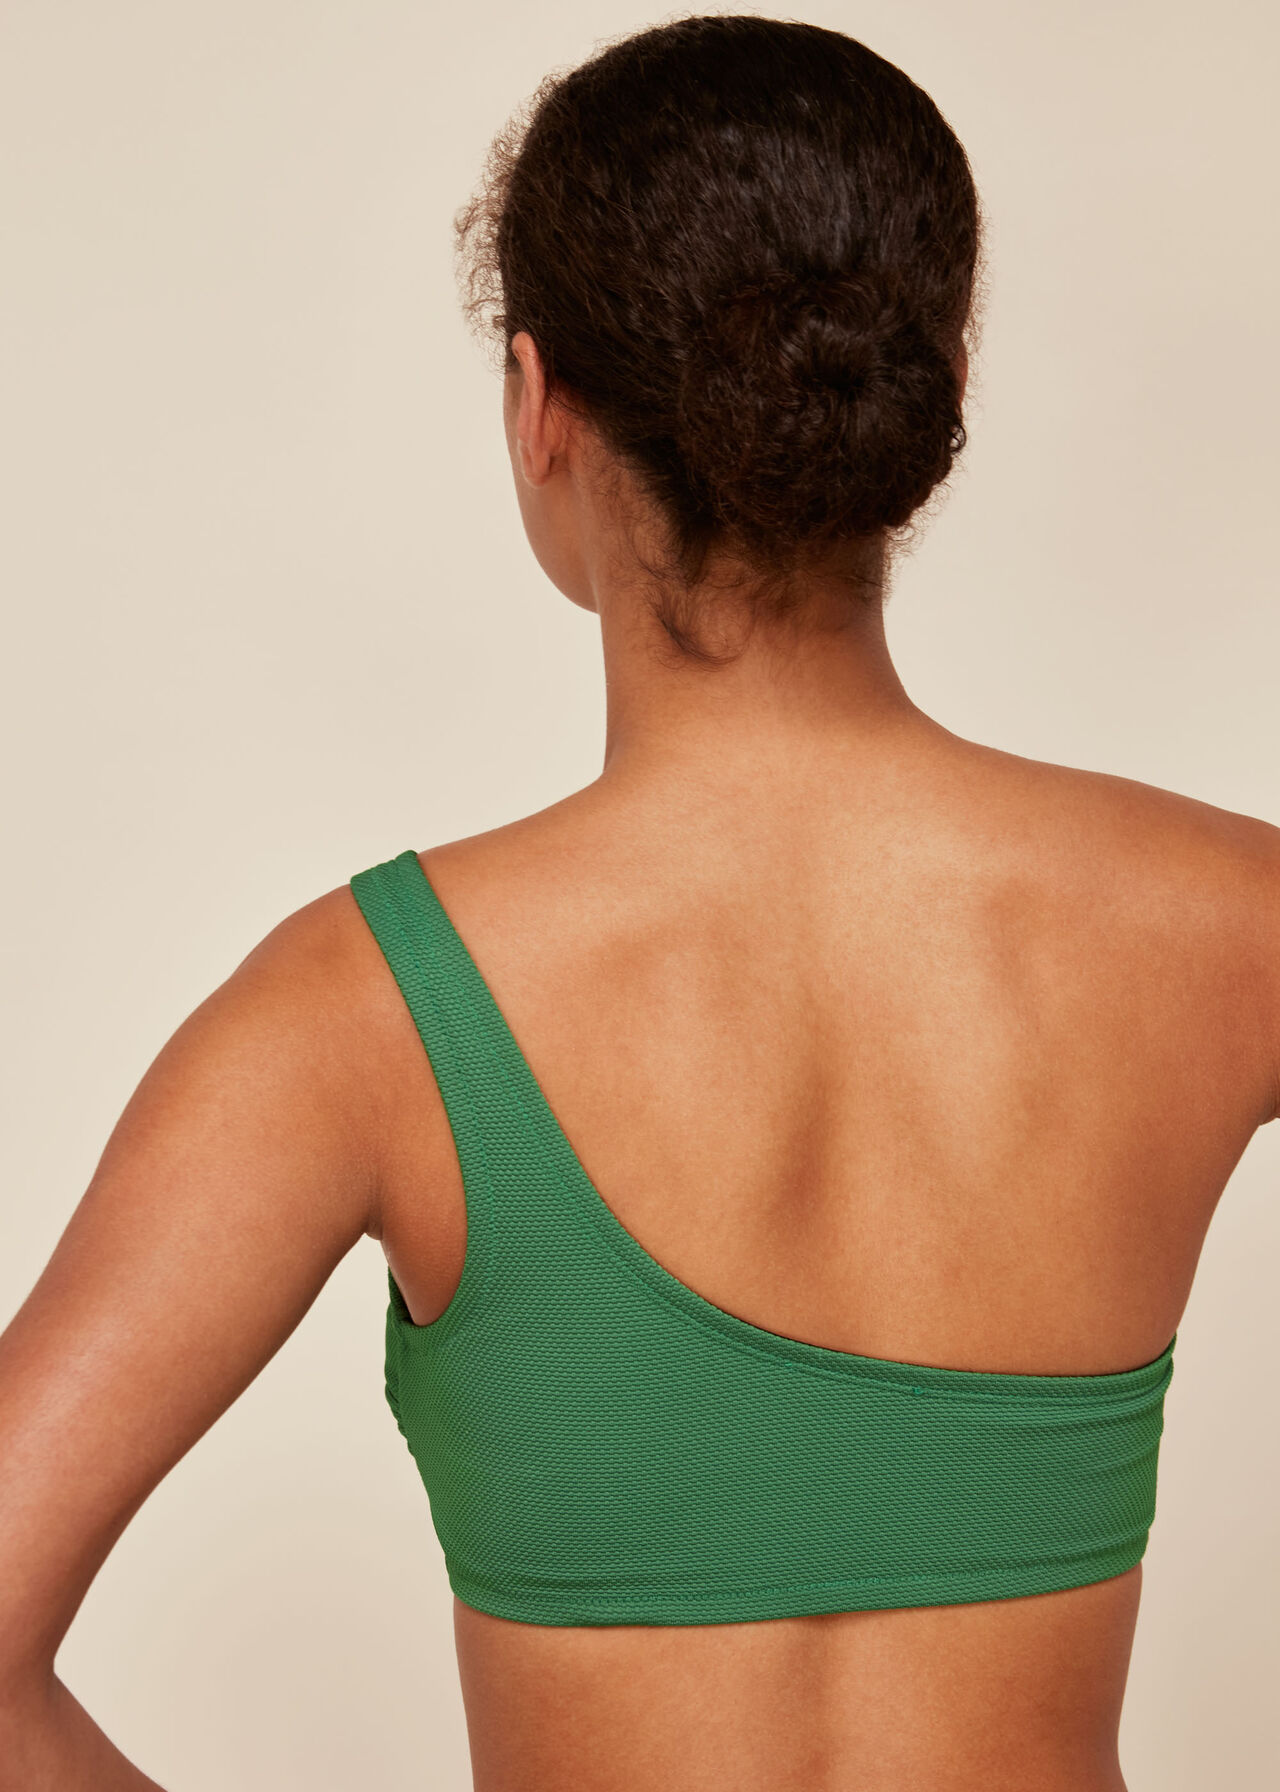 Textured Tort Ring Bikini Top